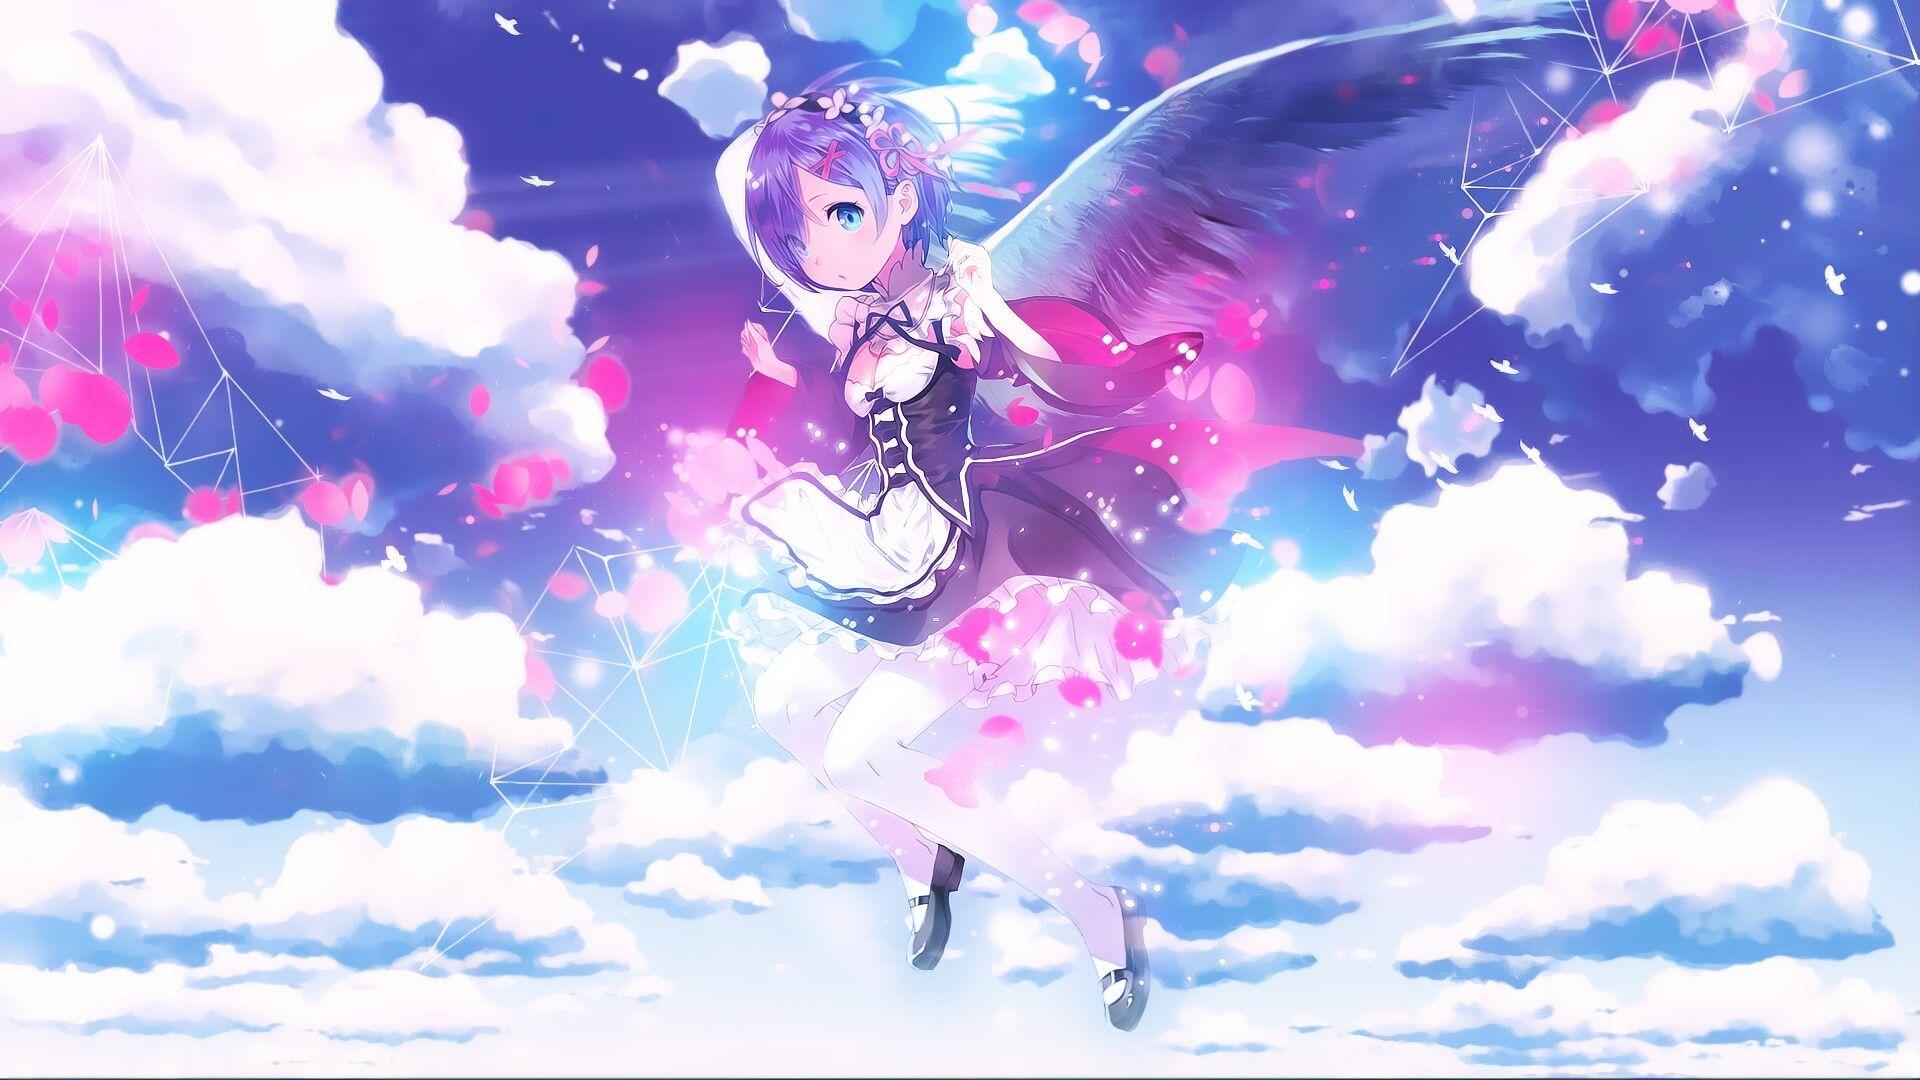 雷姆 从零开始的异世界 Android wallpaper anime, Anime, Re zero